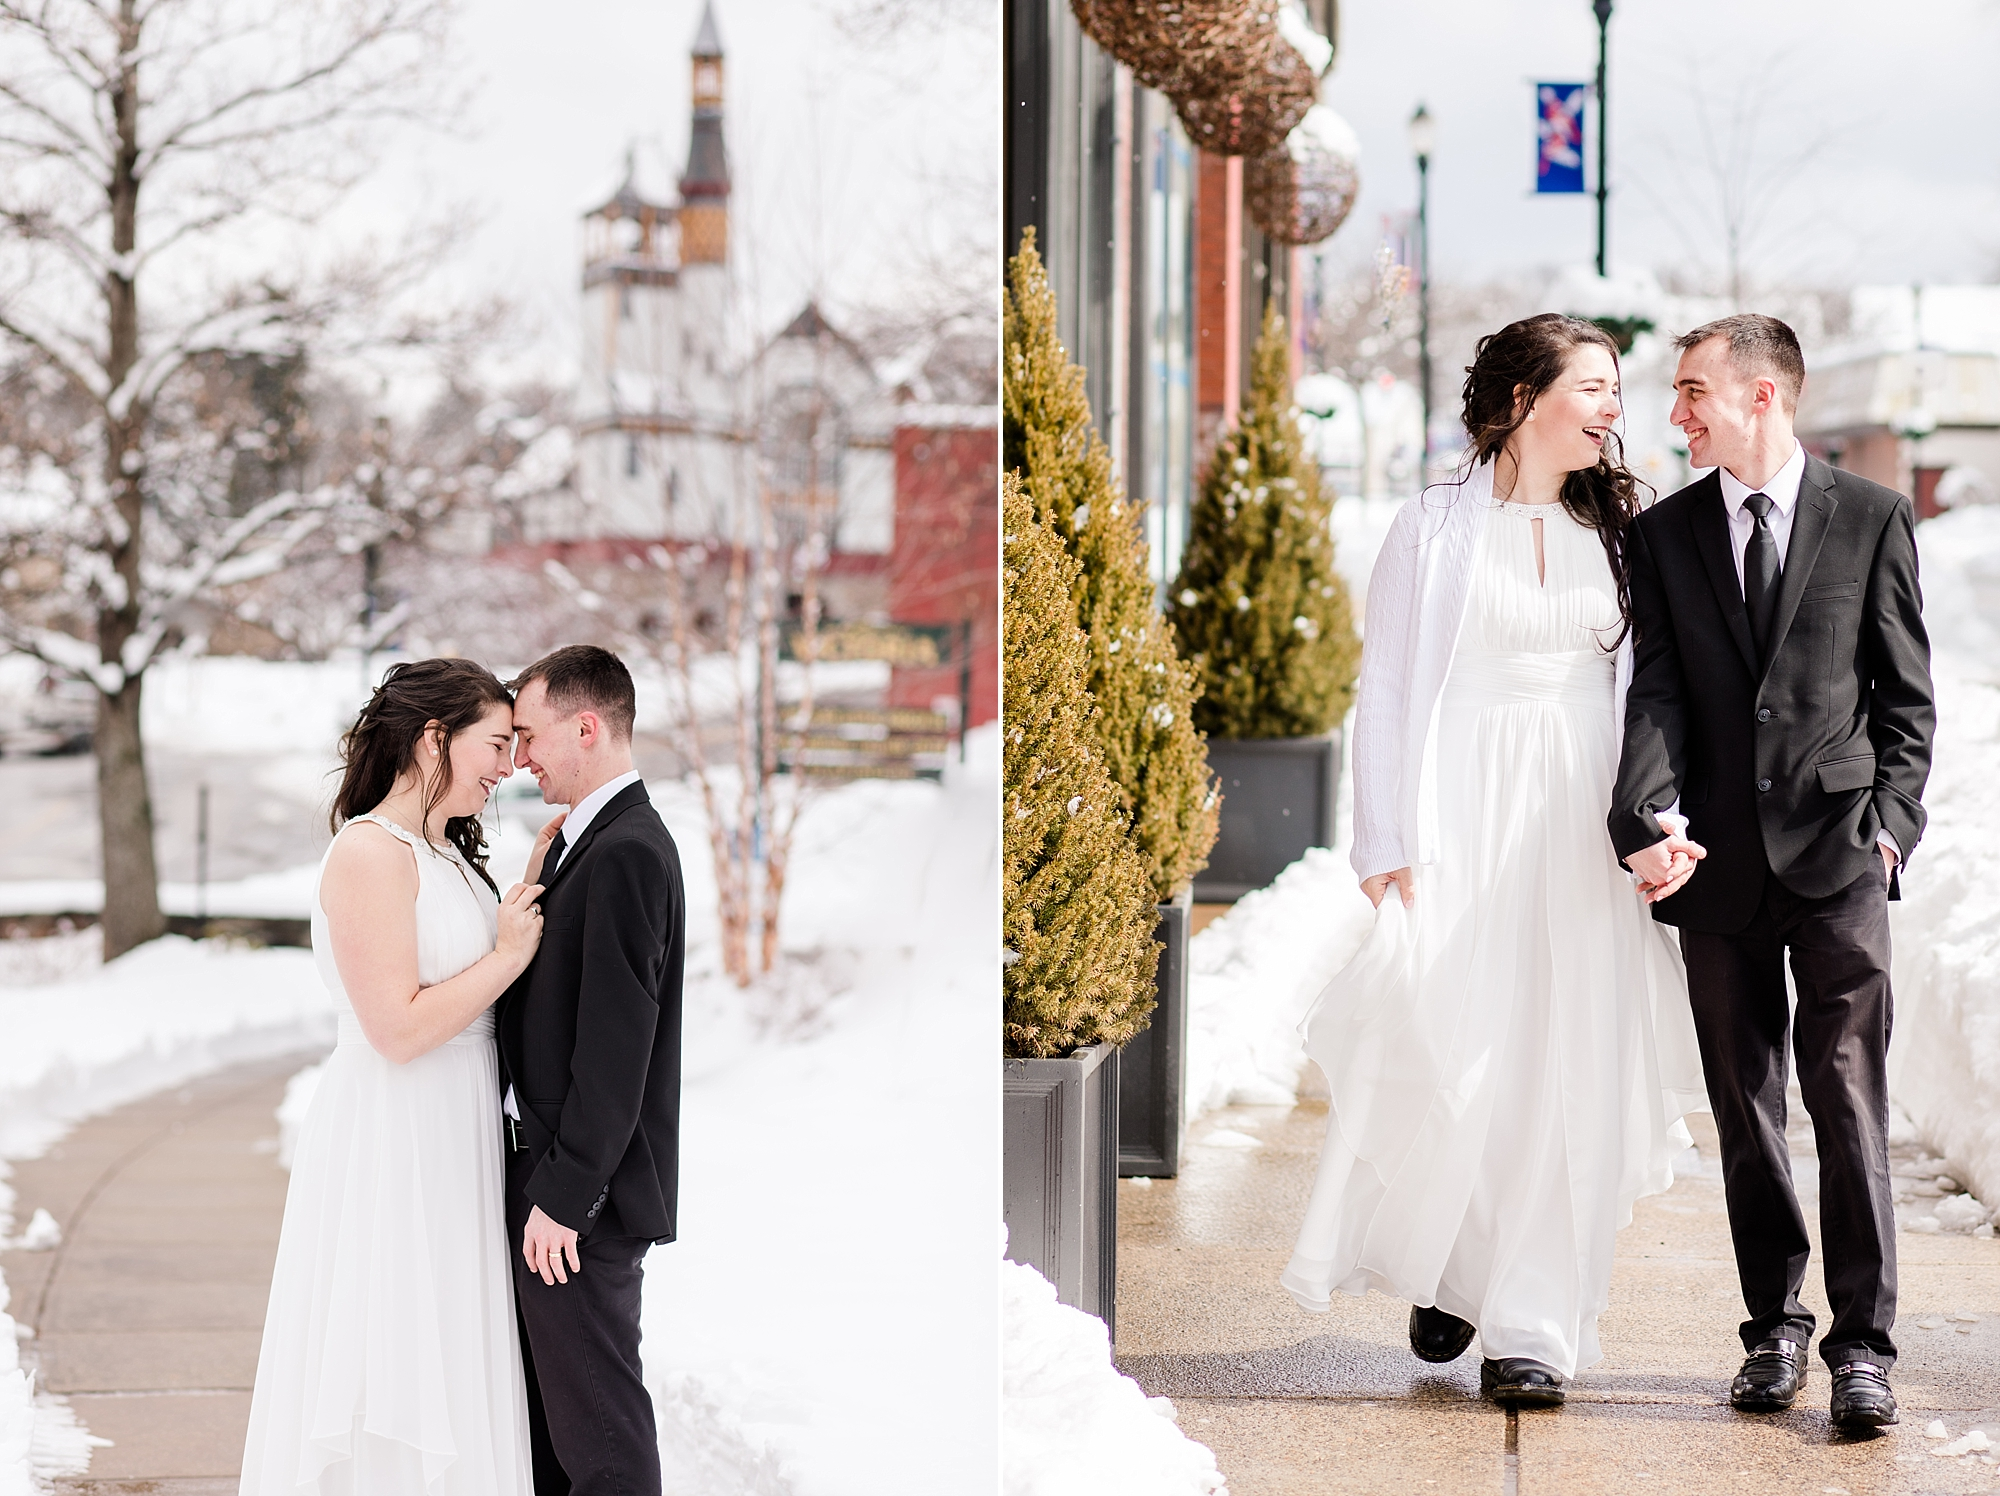 eisleyimages-downtown-marlboro-wedding-newengland_0029.jpg